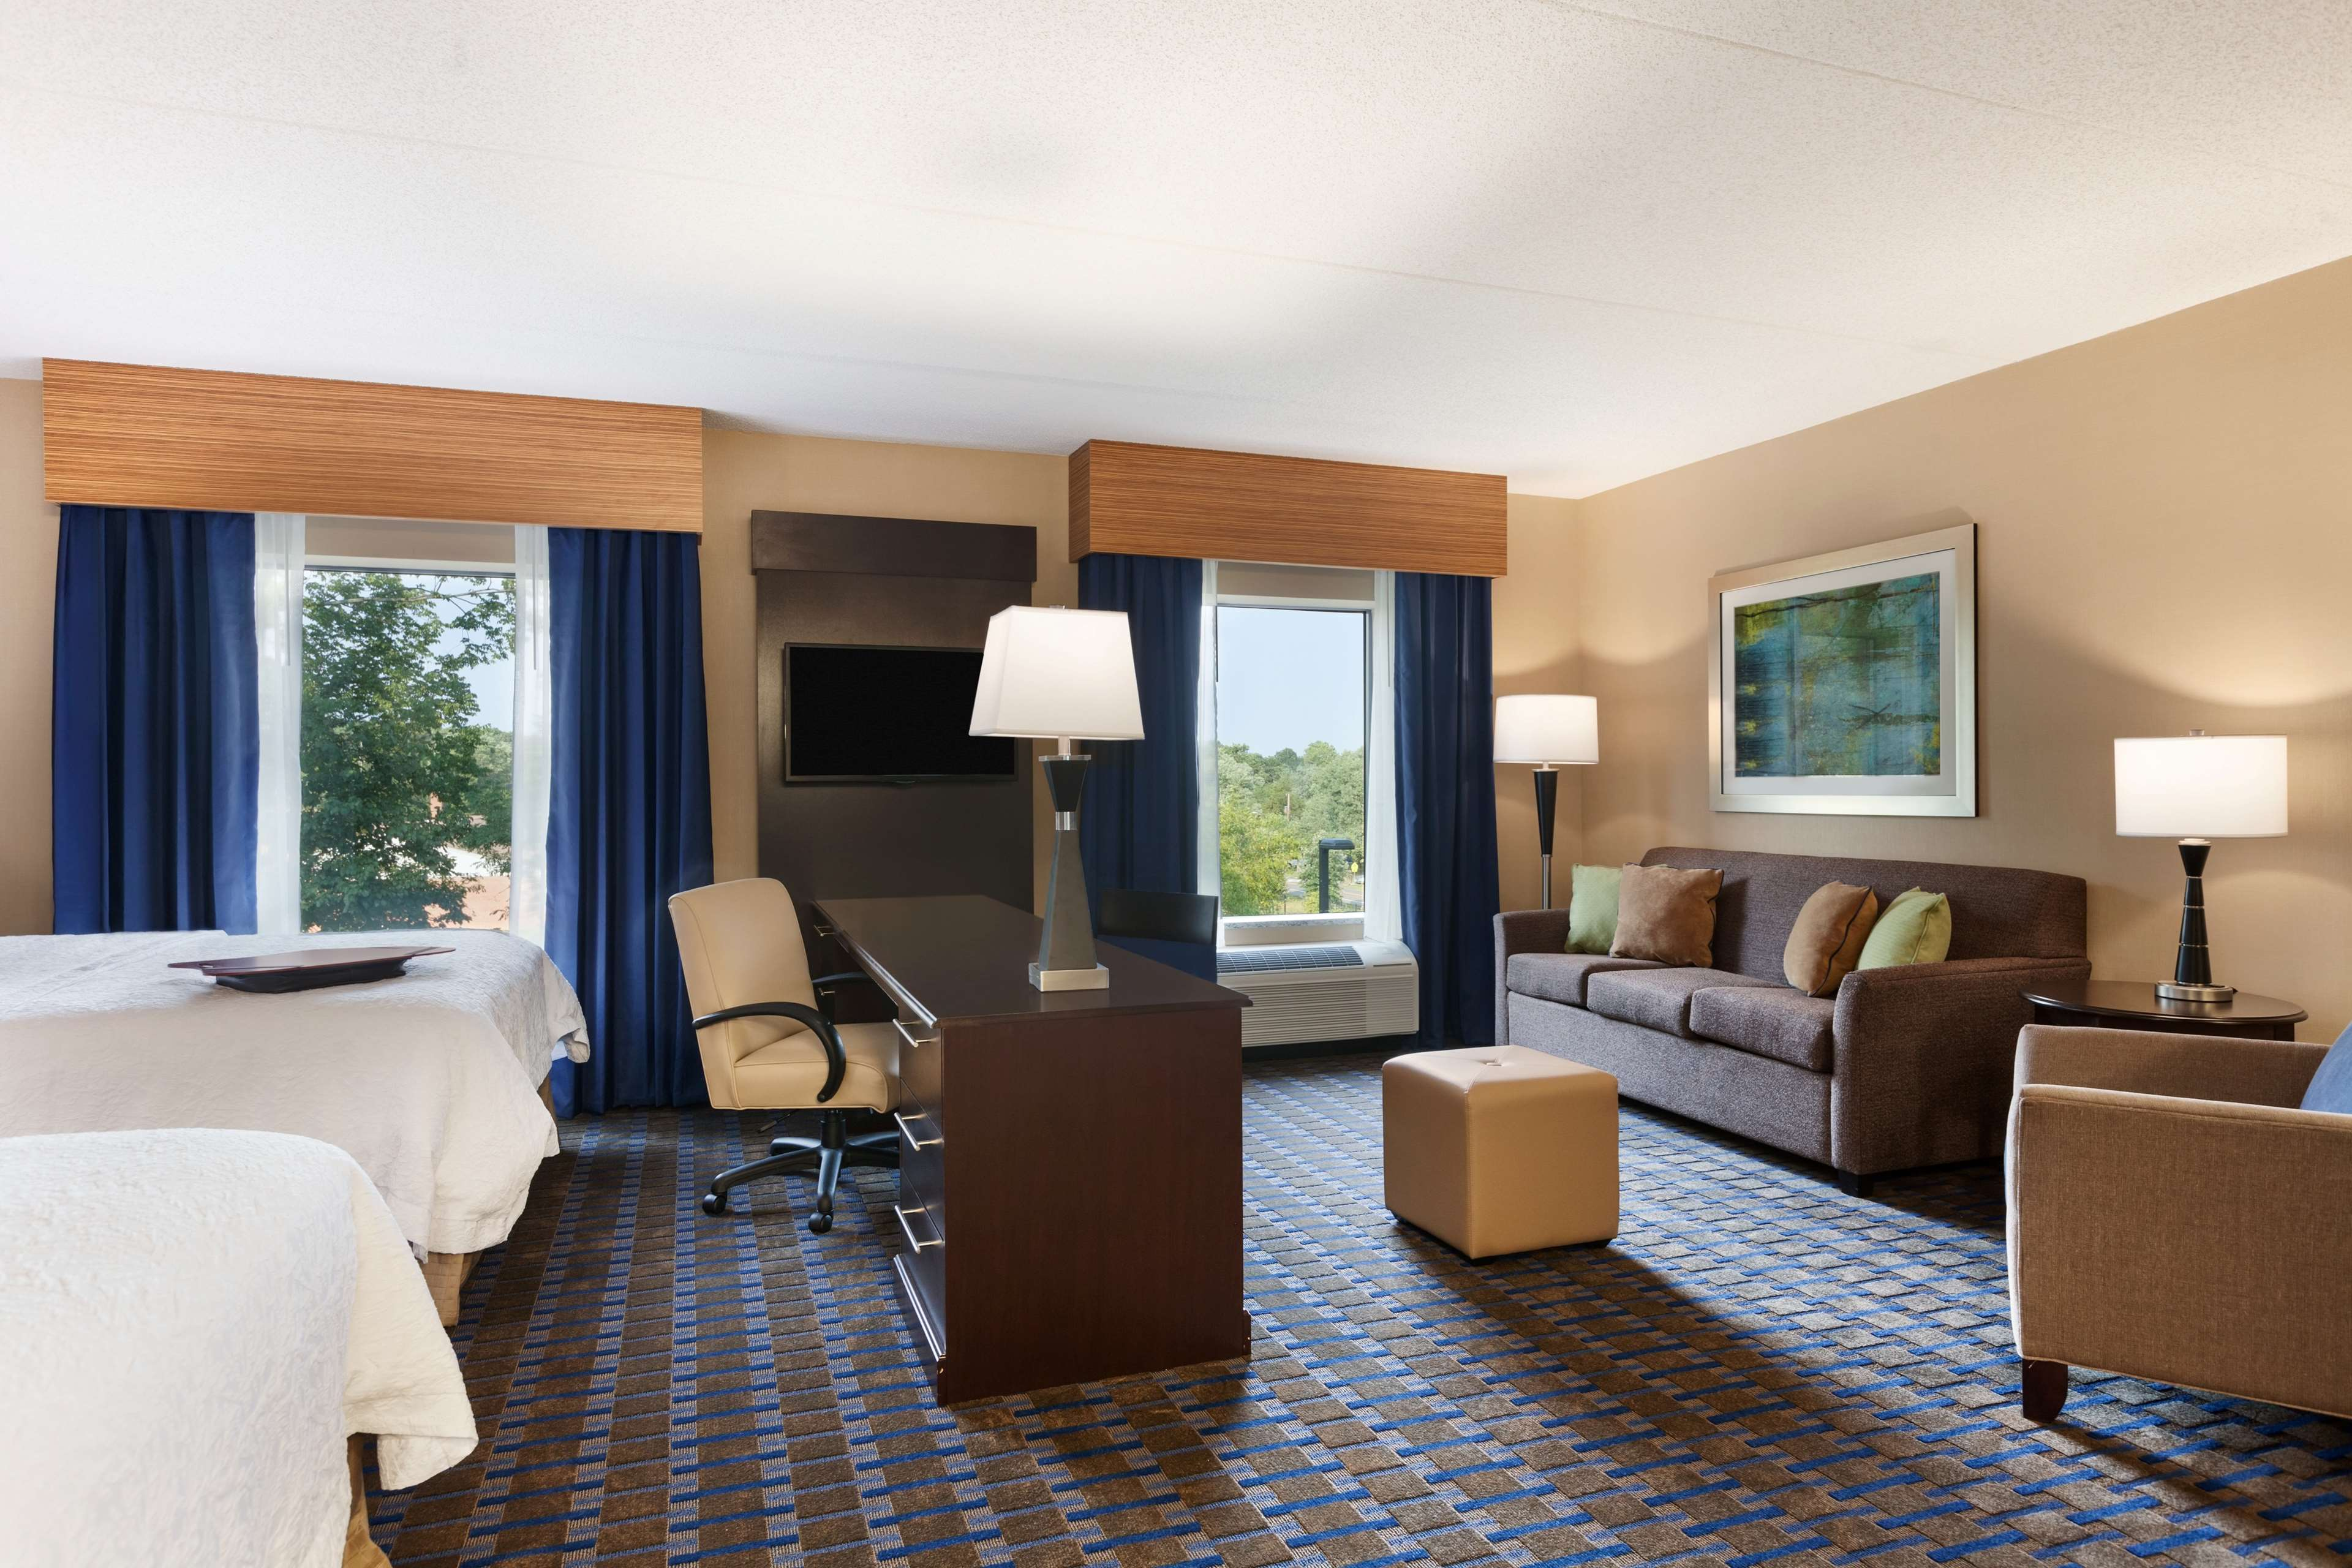 Hampton Inn & Suites Camp Springs/Andrews AFB image 6